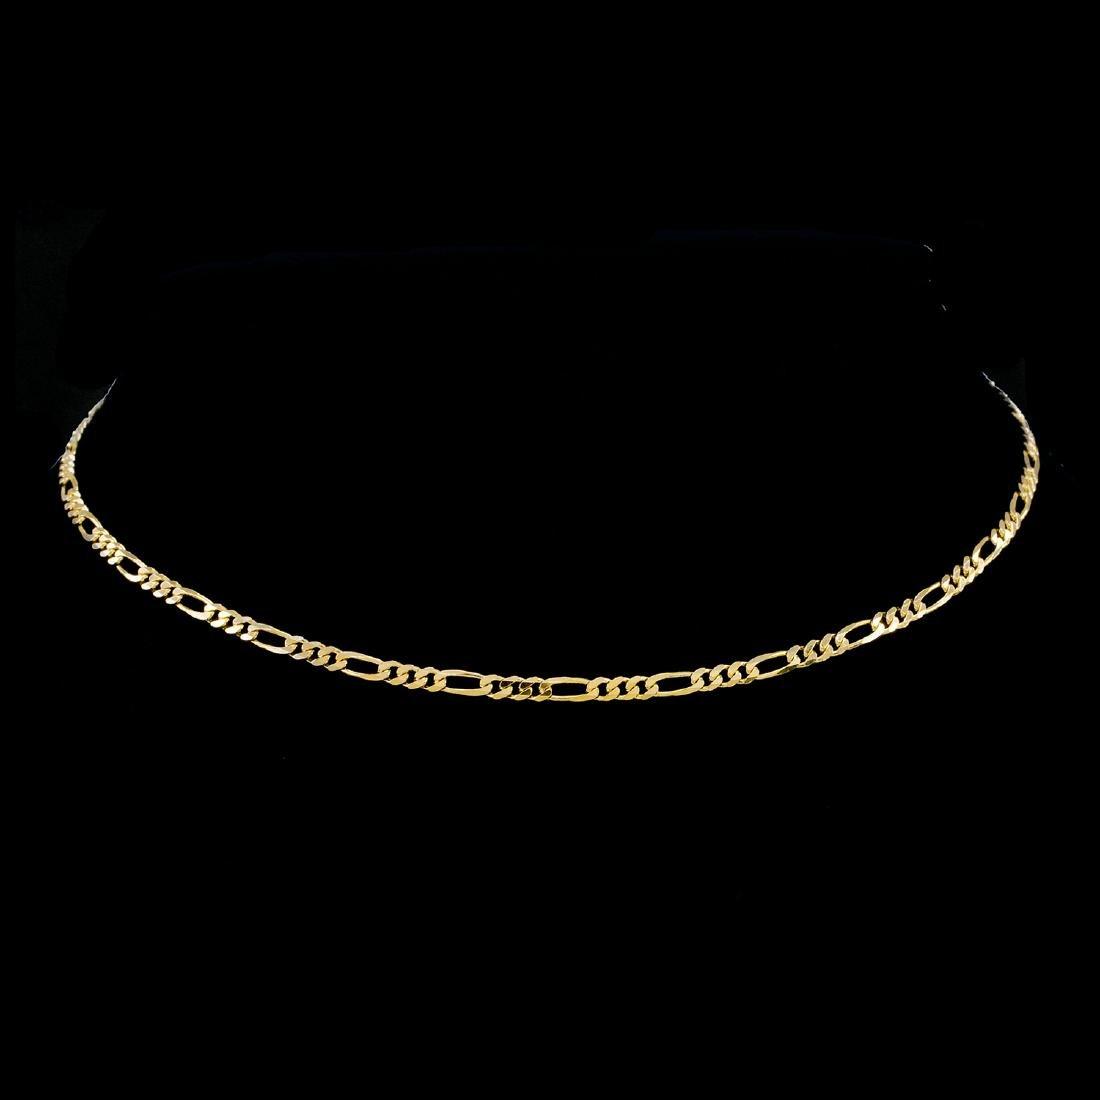 *Fine Jewelry 14KT Gold, 6.5GM. 16'' Chain Necklace (GL